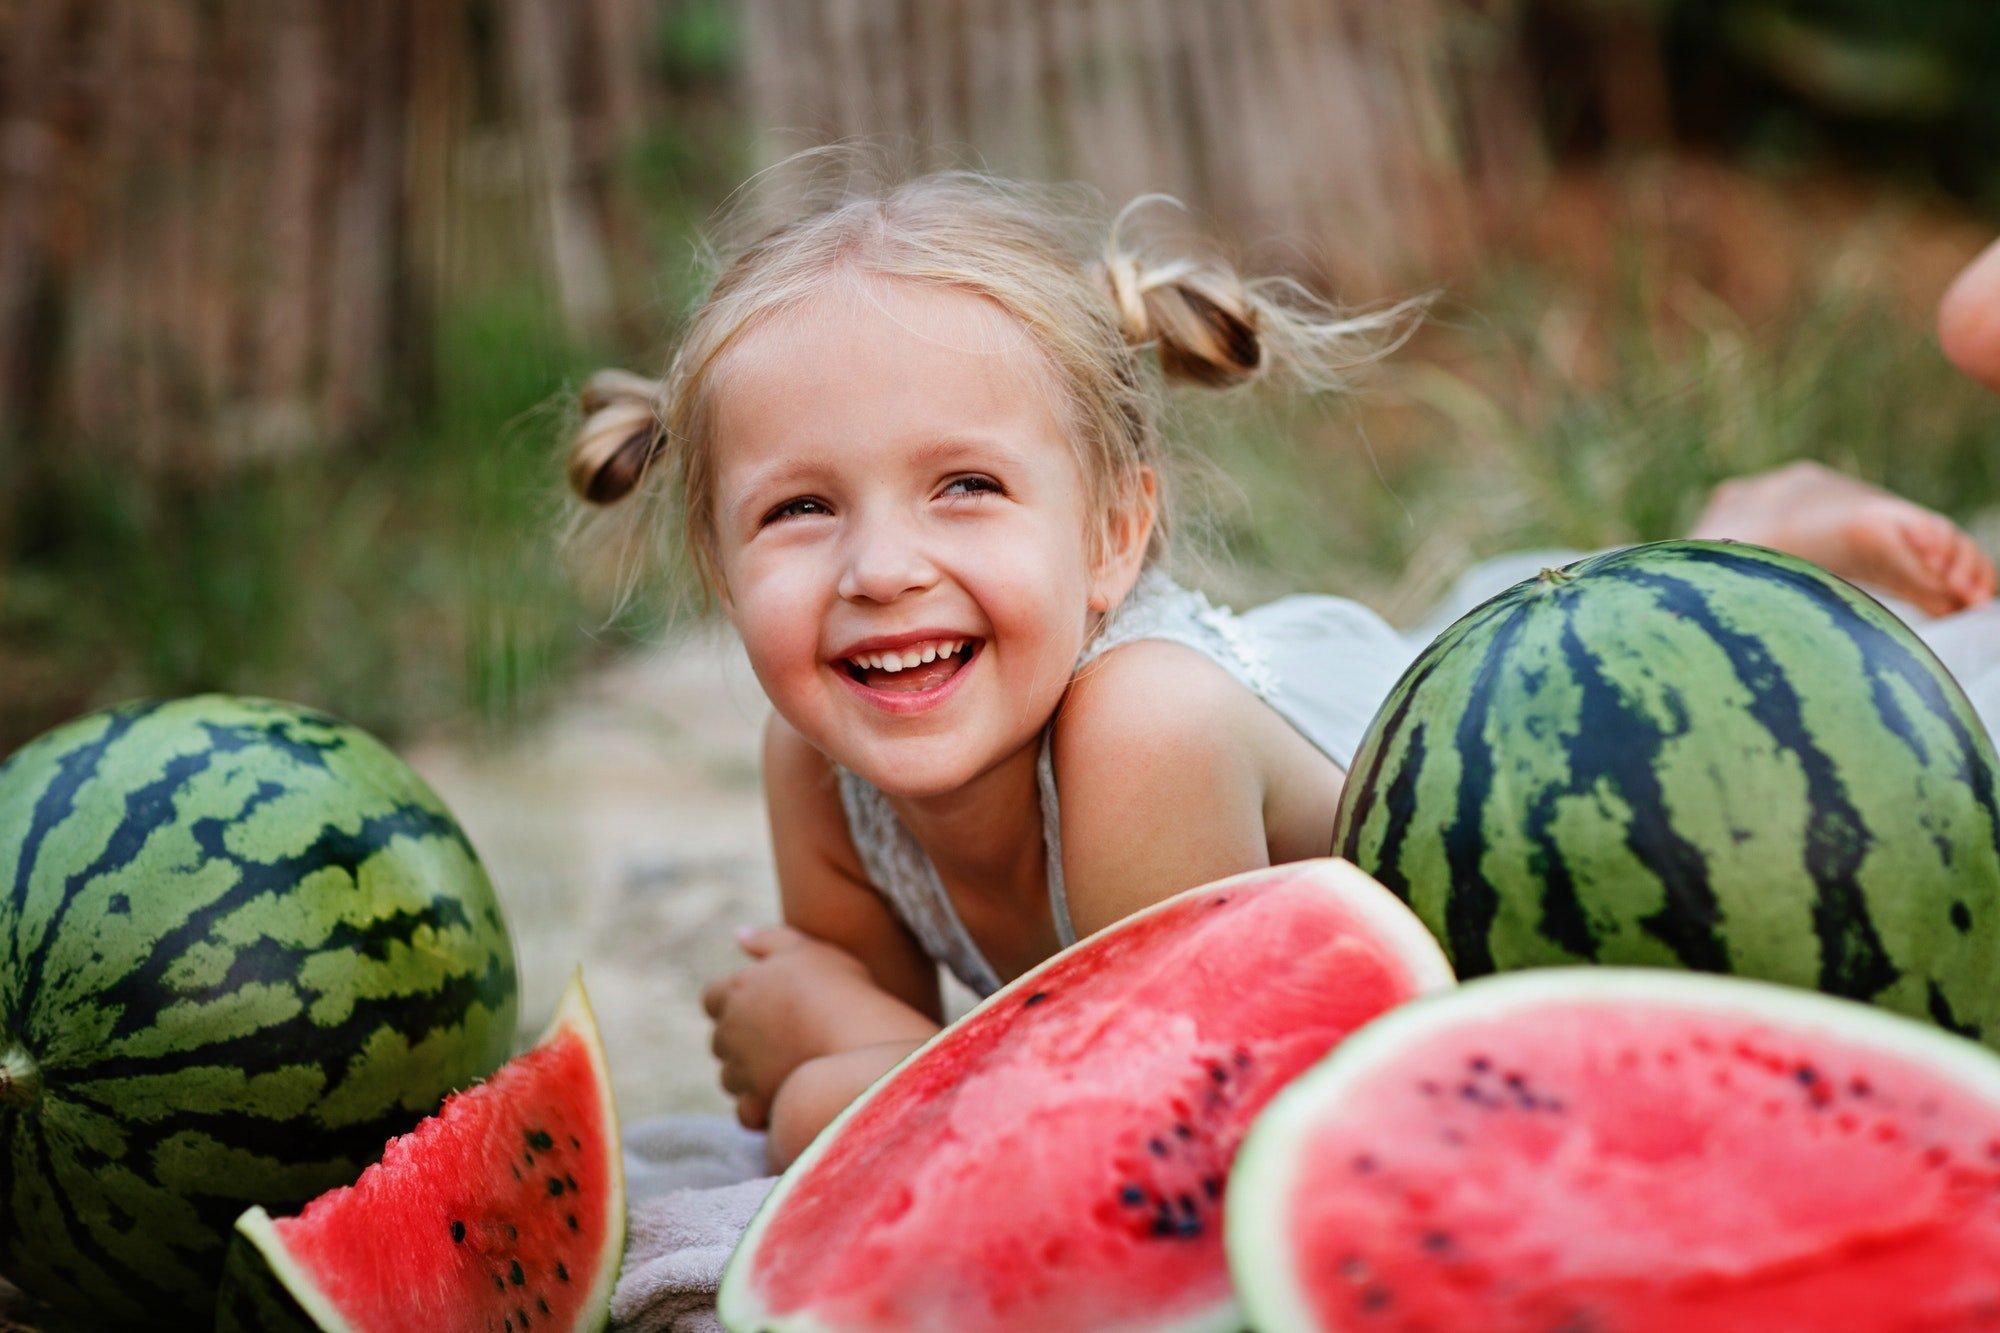 dental sealants against cavities in children